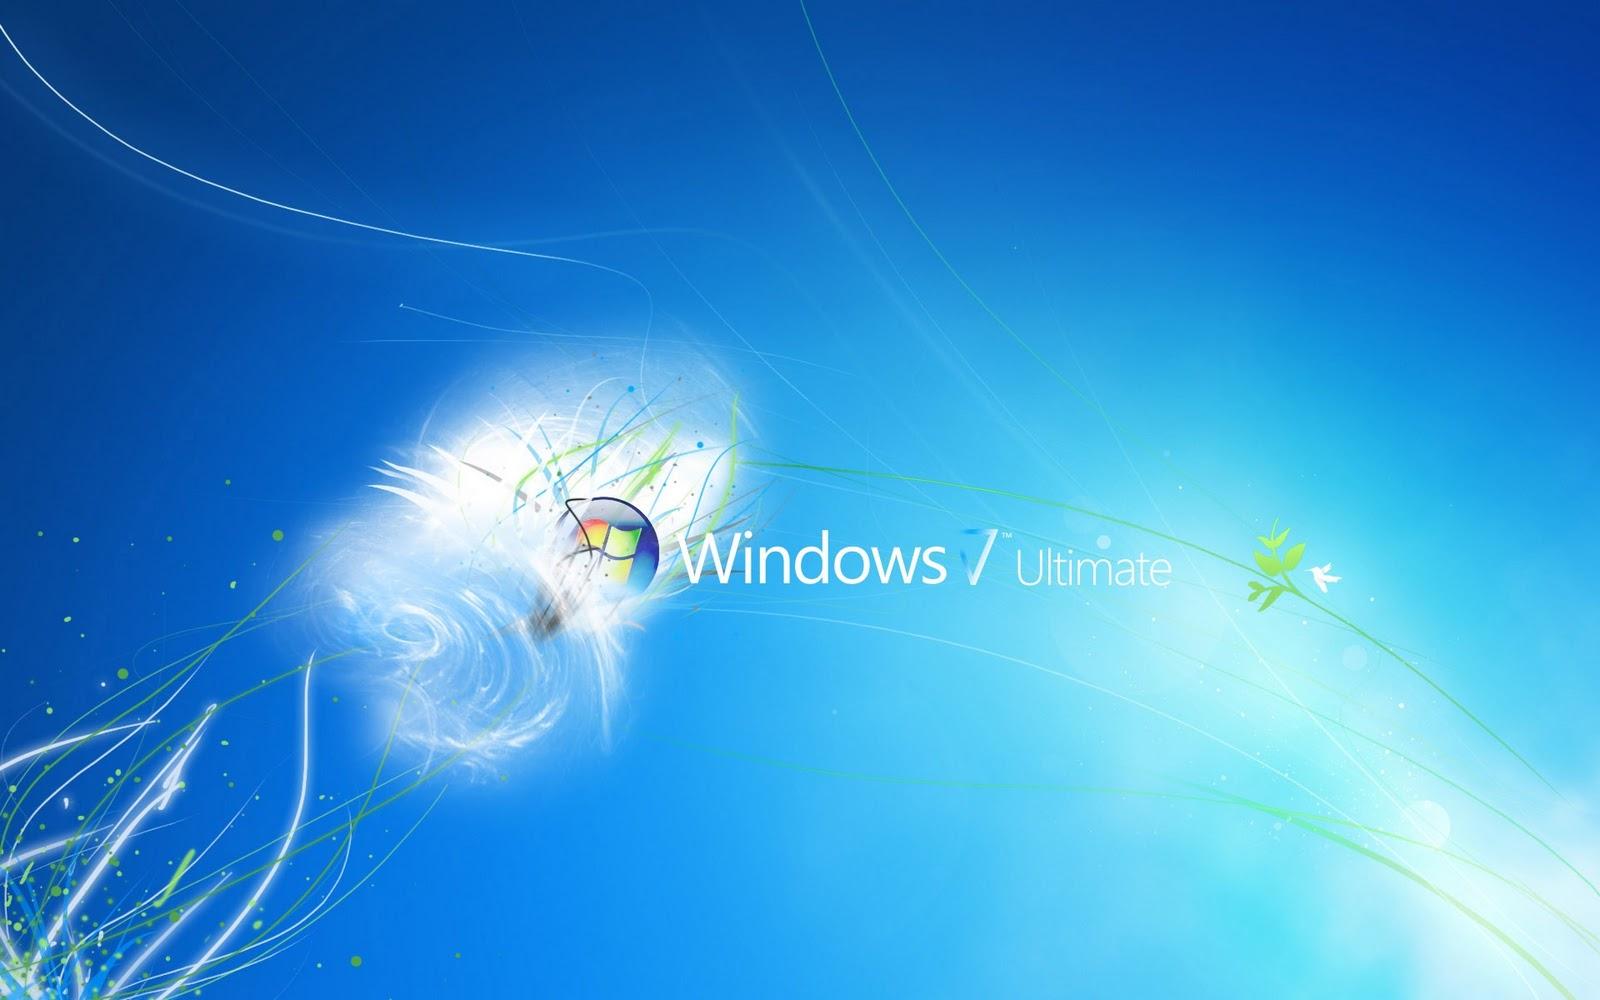 Windows-7-achtergronden-windows-7-wallpapers-15.jpg